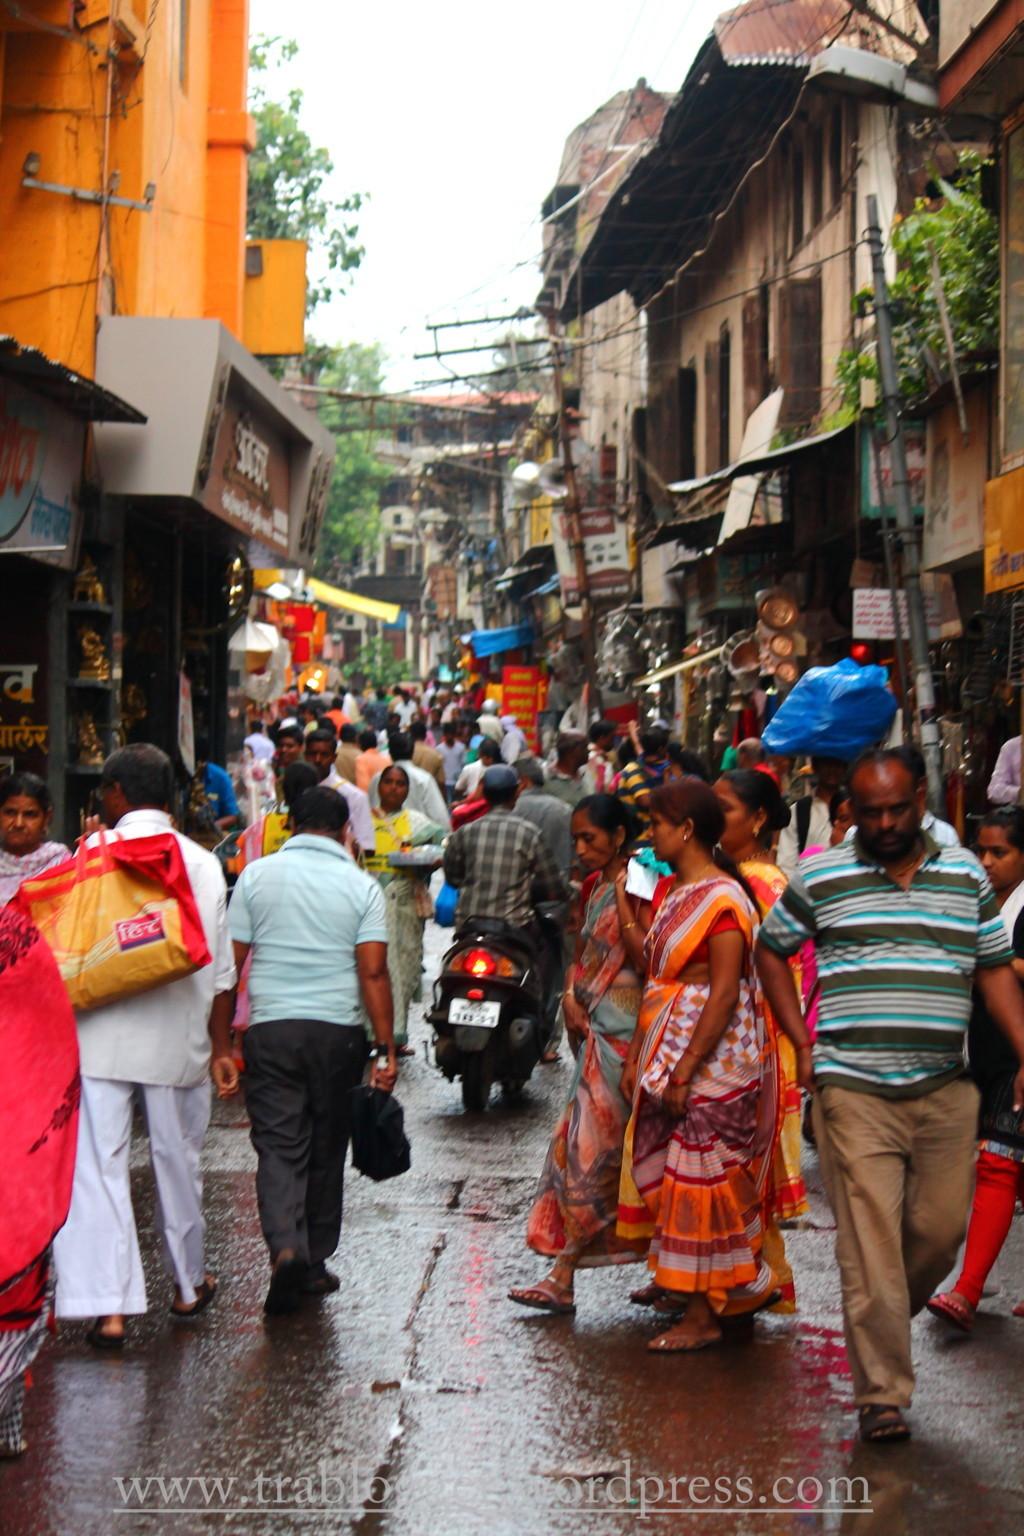 Nashik streets were crowded